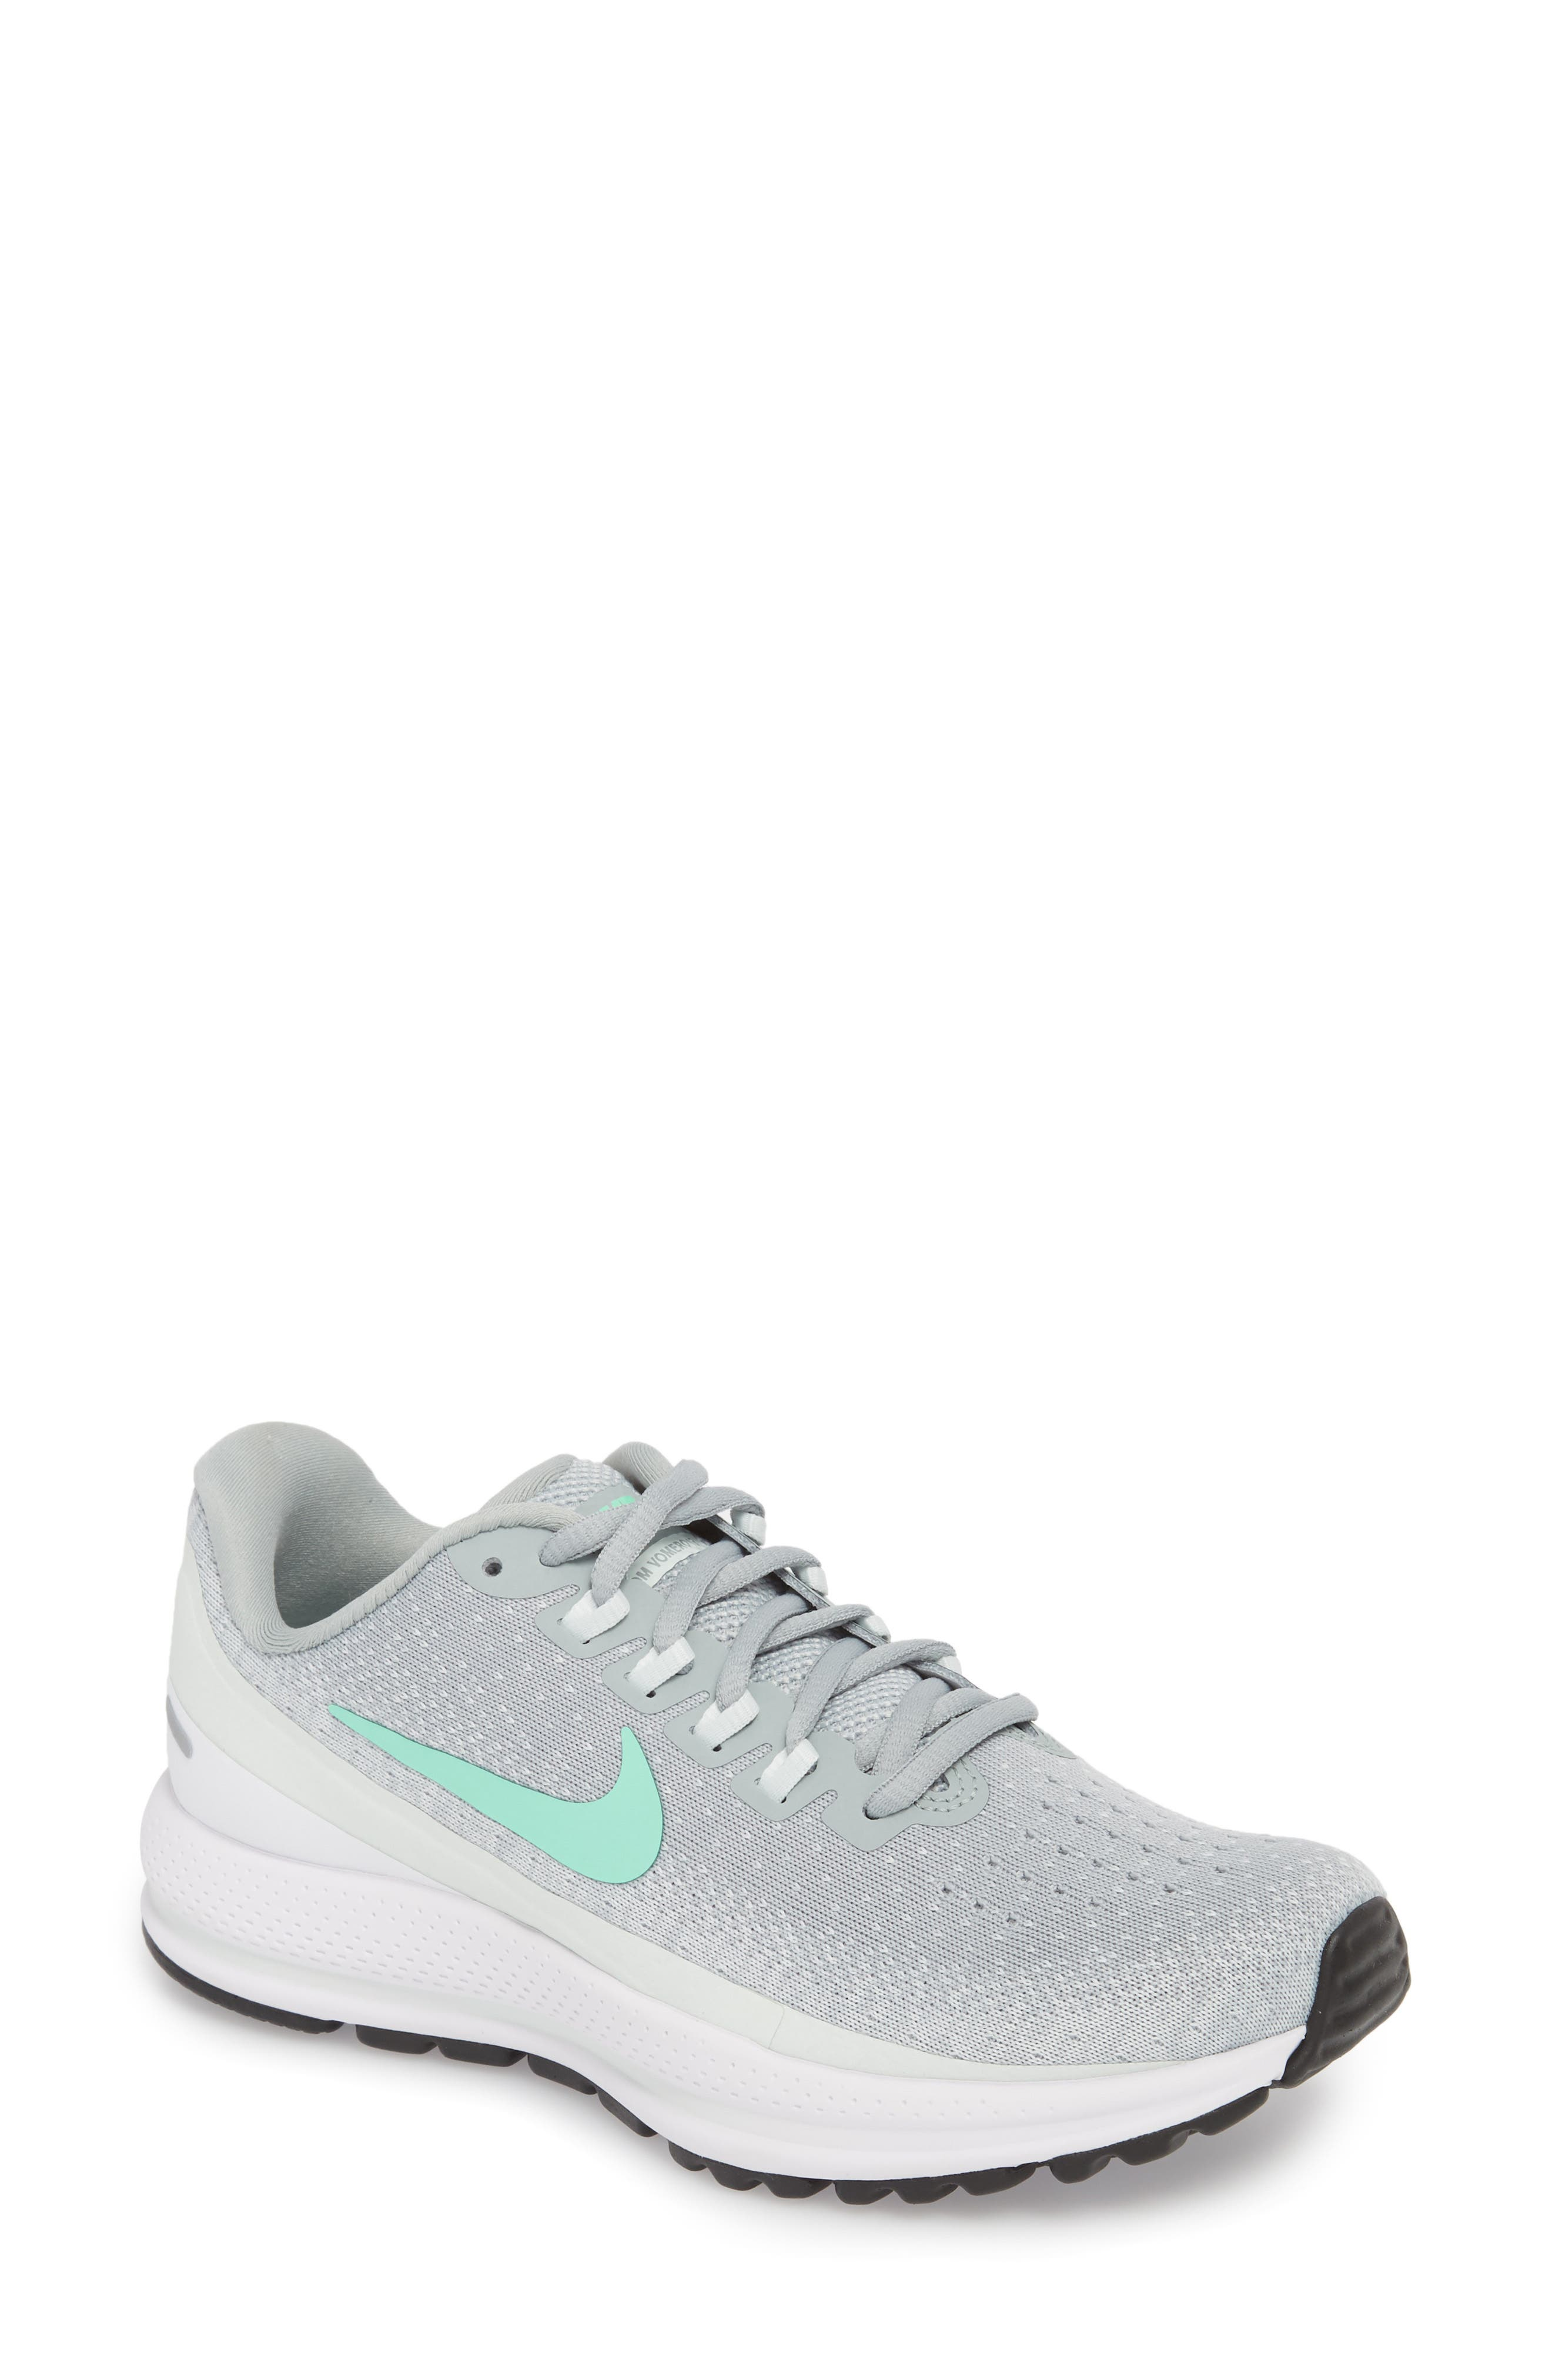 Air Zoom Vomero 13 Running Shoe,                             Main thumbnail 1, color,                             Light Pumice/ Green Glow